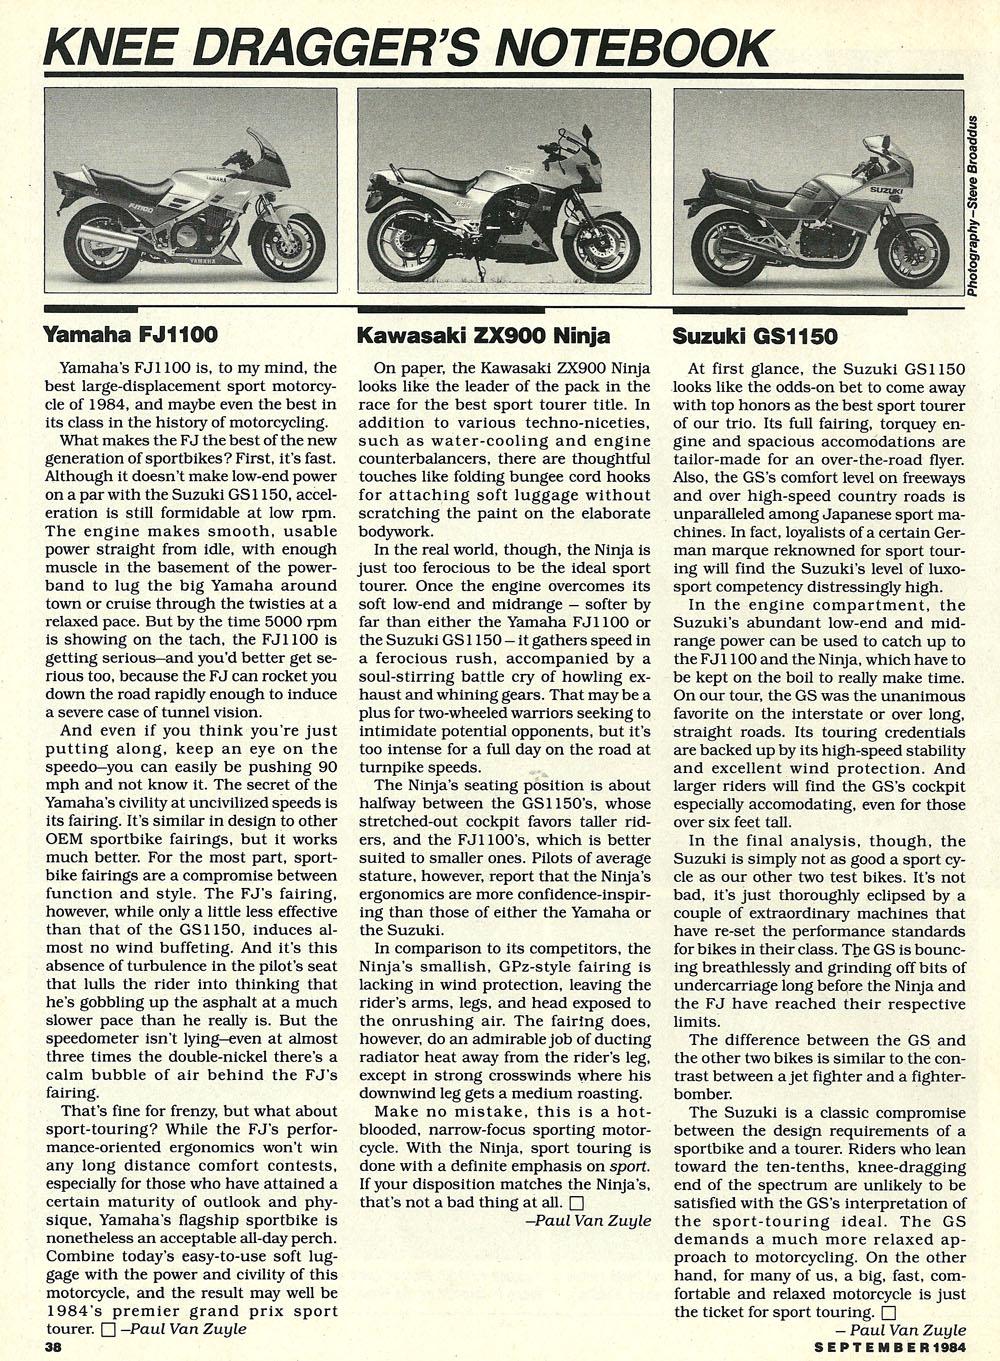 1984 fj1100 zx900 gs1150 road test 05.jpg